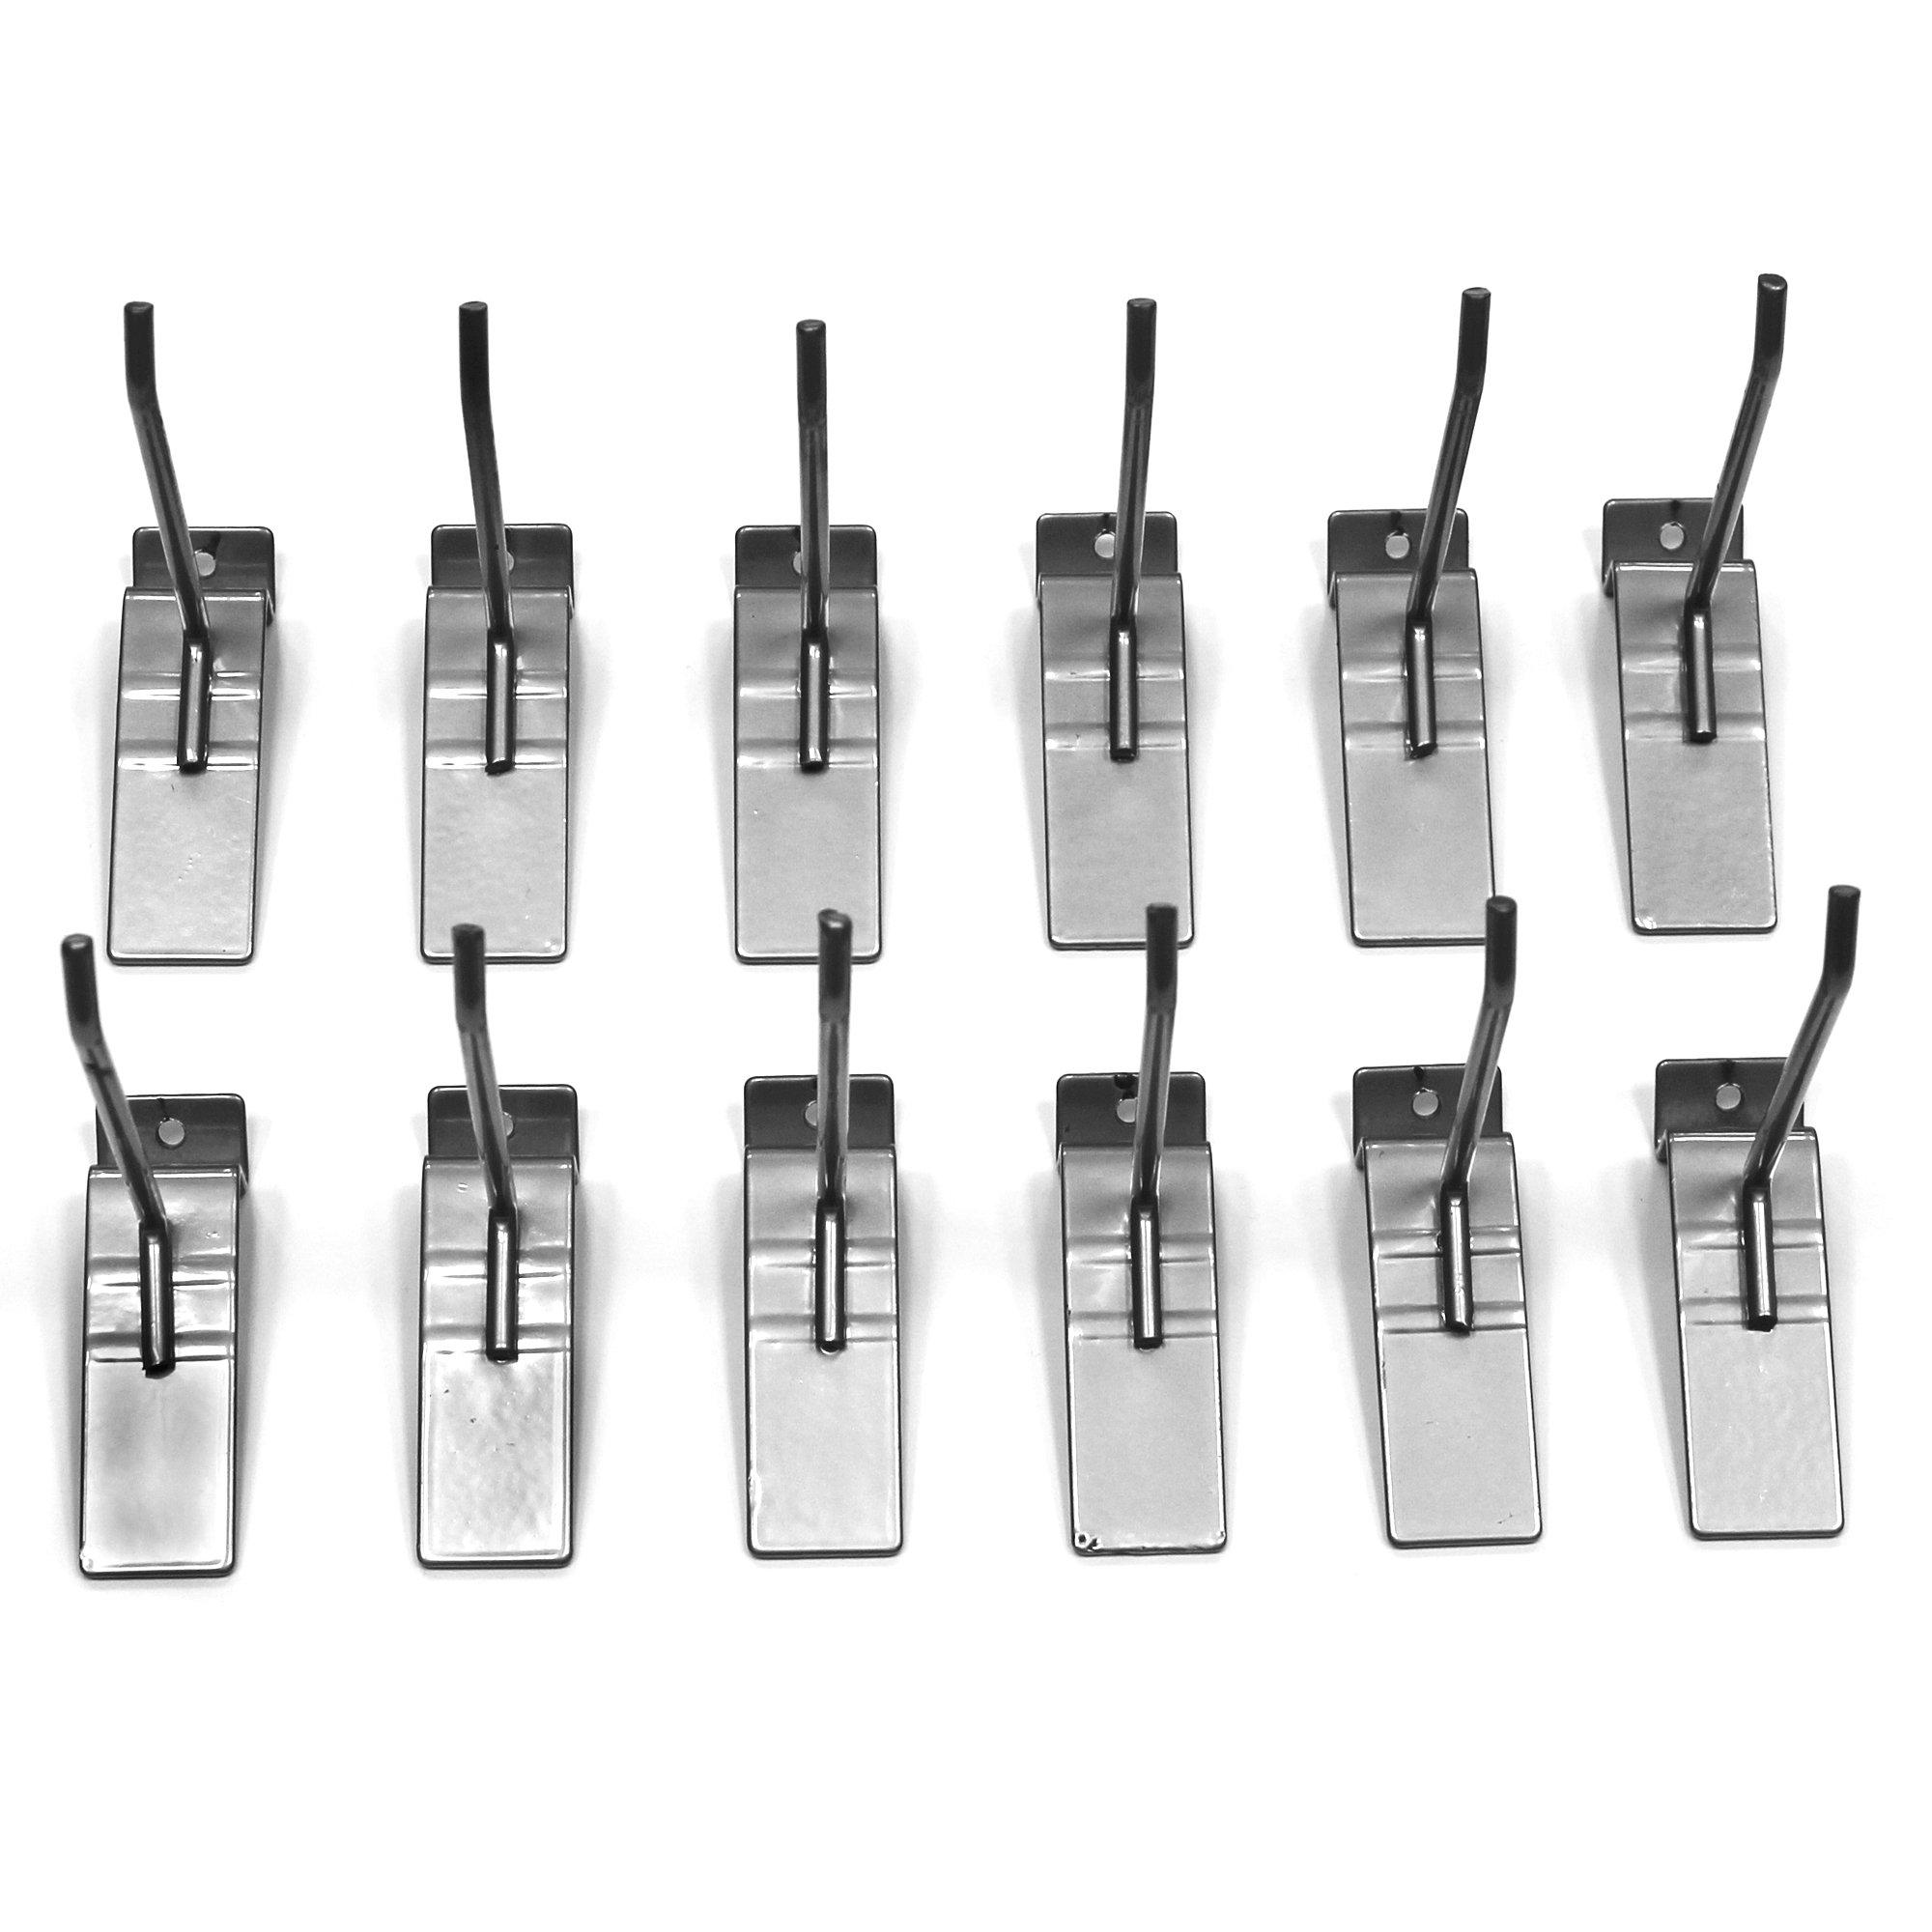 Proslat 13002 4-Inch Steel Hooks Designed for Proslat PVC Slatwall, 12-Pack